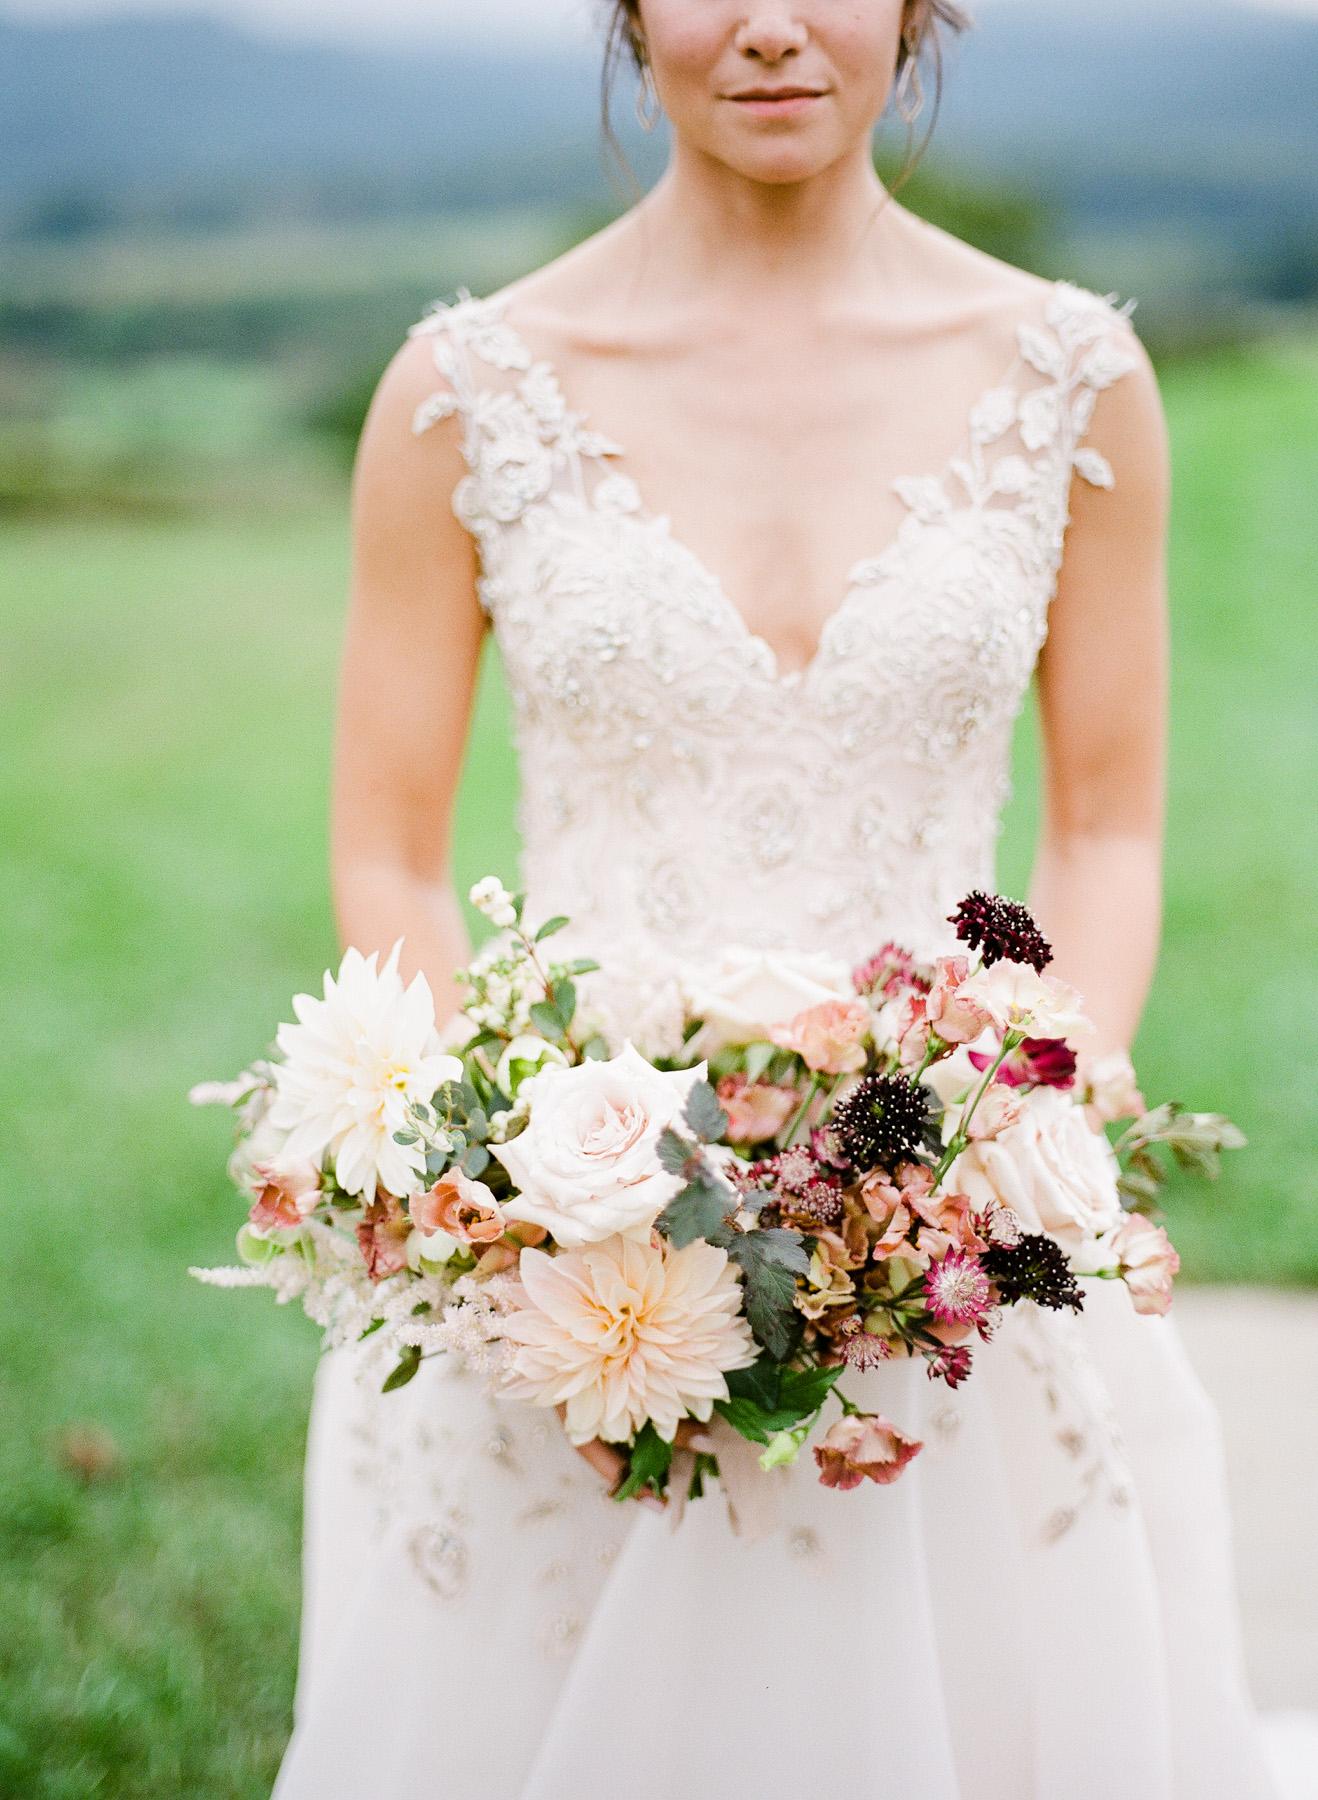 Pippin-Hill-Farm-and-Vinyards-Wedding-Film-Photography-11.jpg